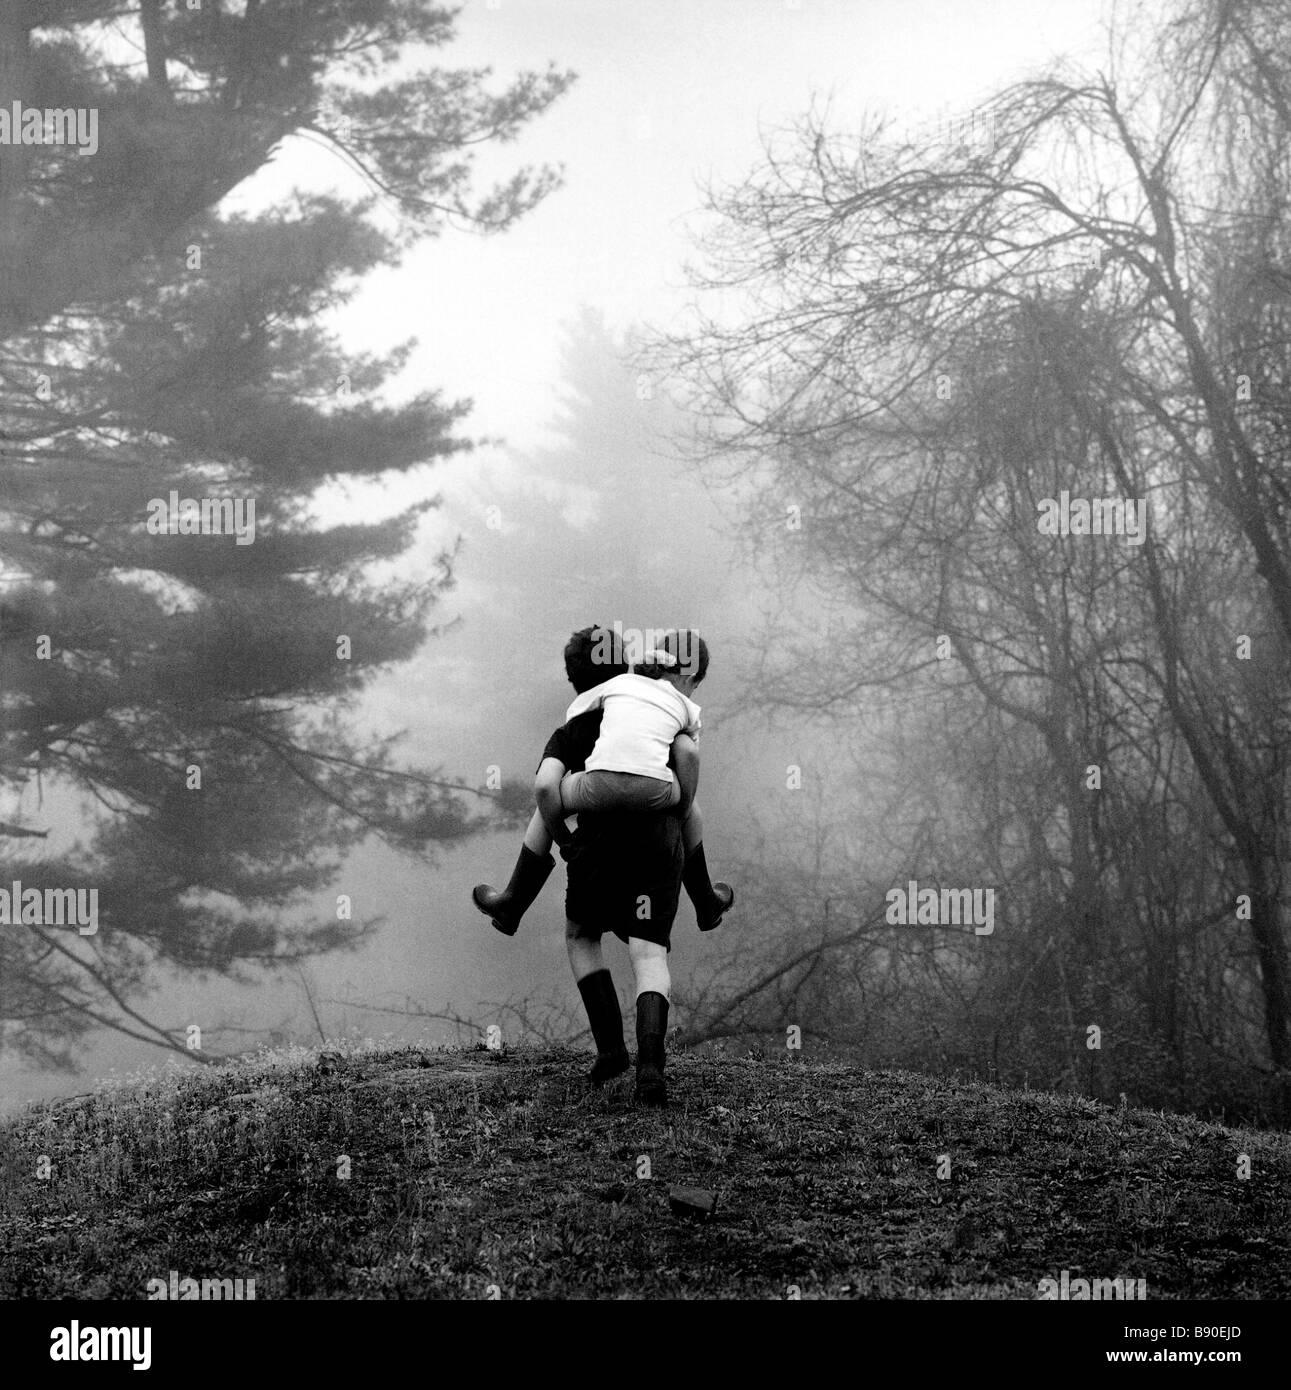 FL2608, Nick KELSH; chico chica de espaldas a través de bosques Imagen De Stock